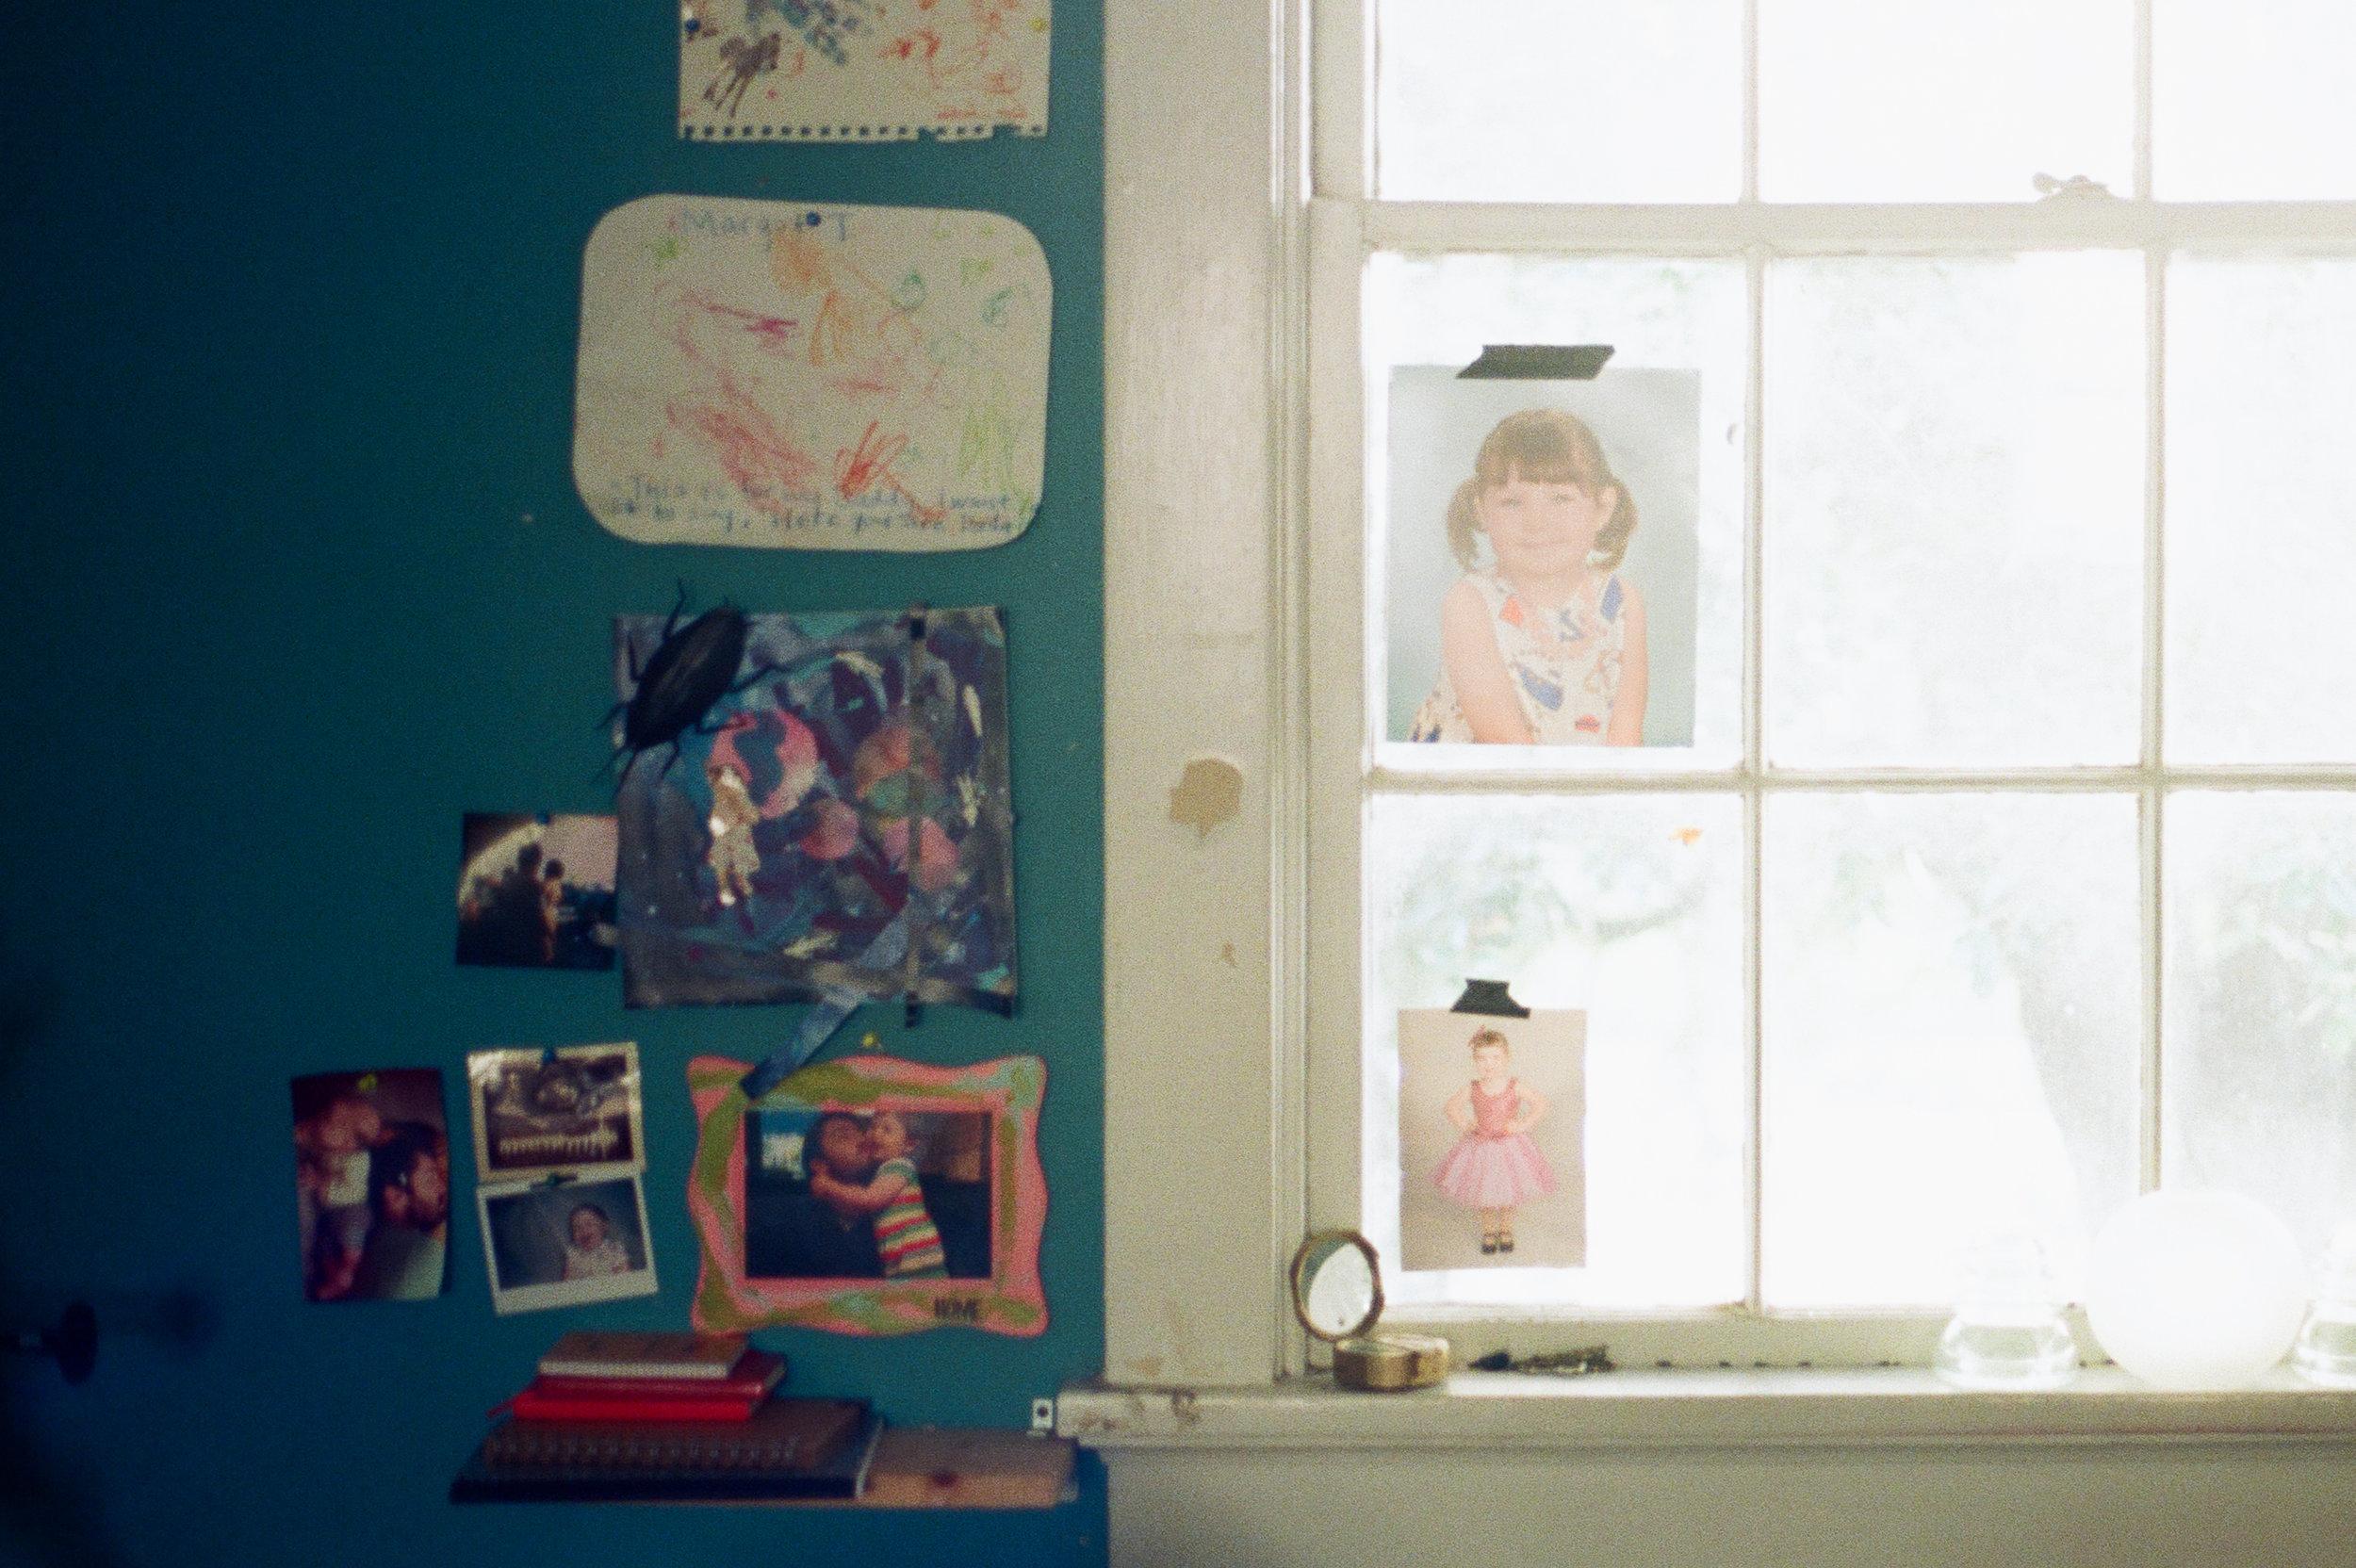 Creative-Spaces-Series-LIMB-James-Templeton-Houston-2017-008.jpg